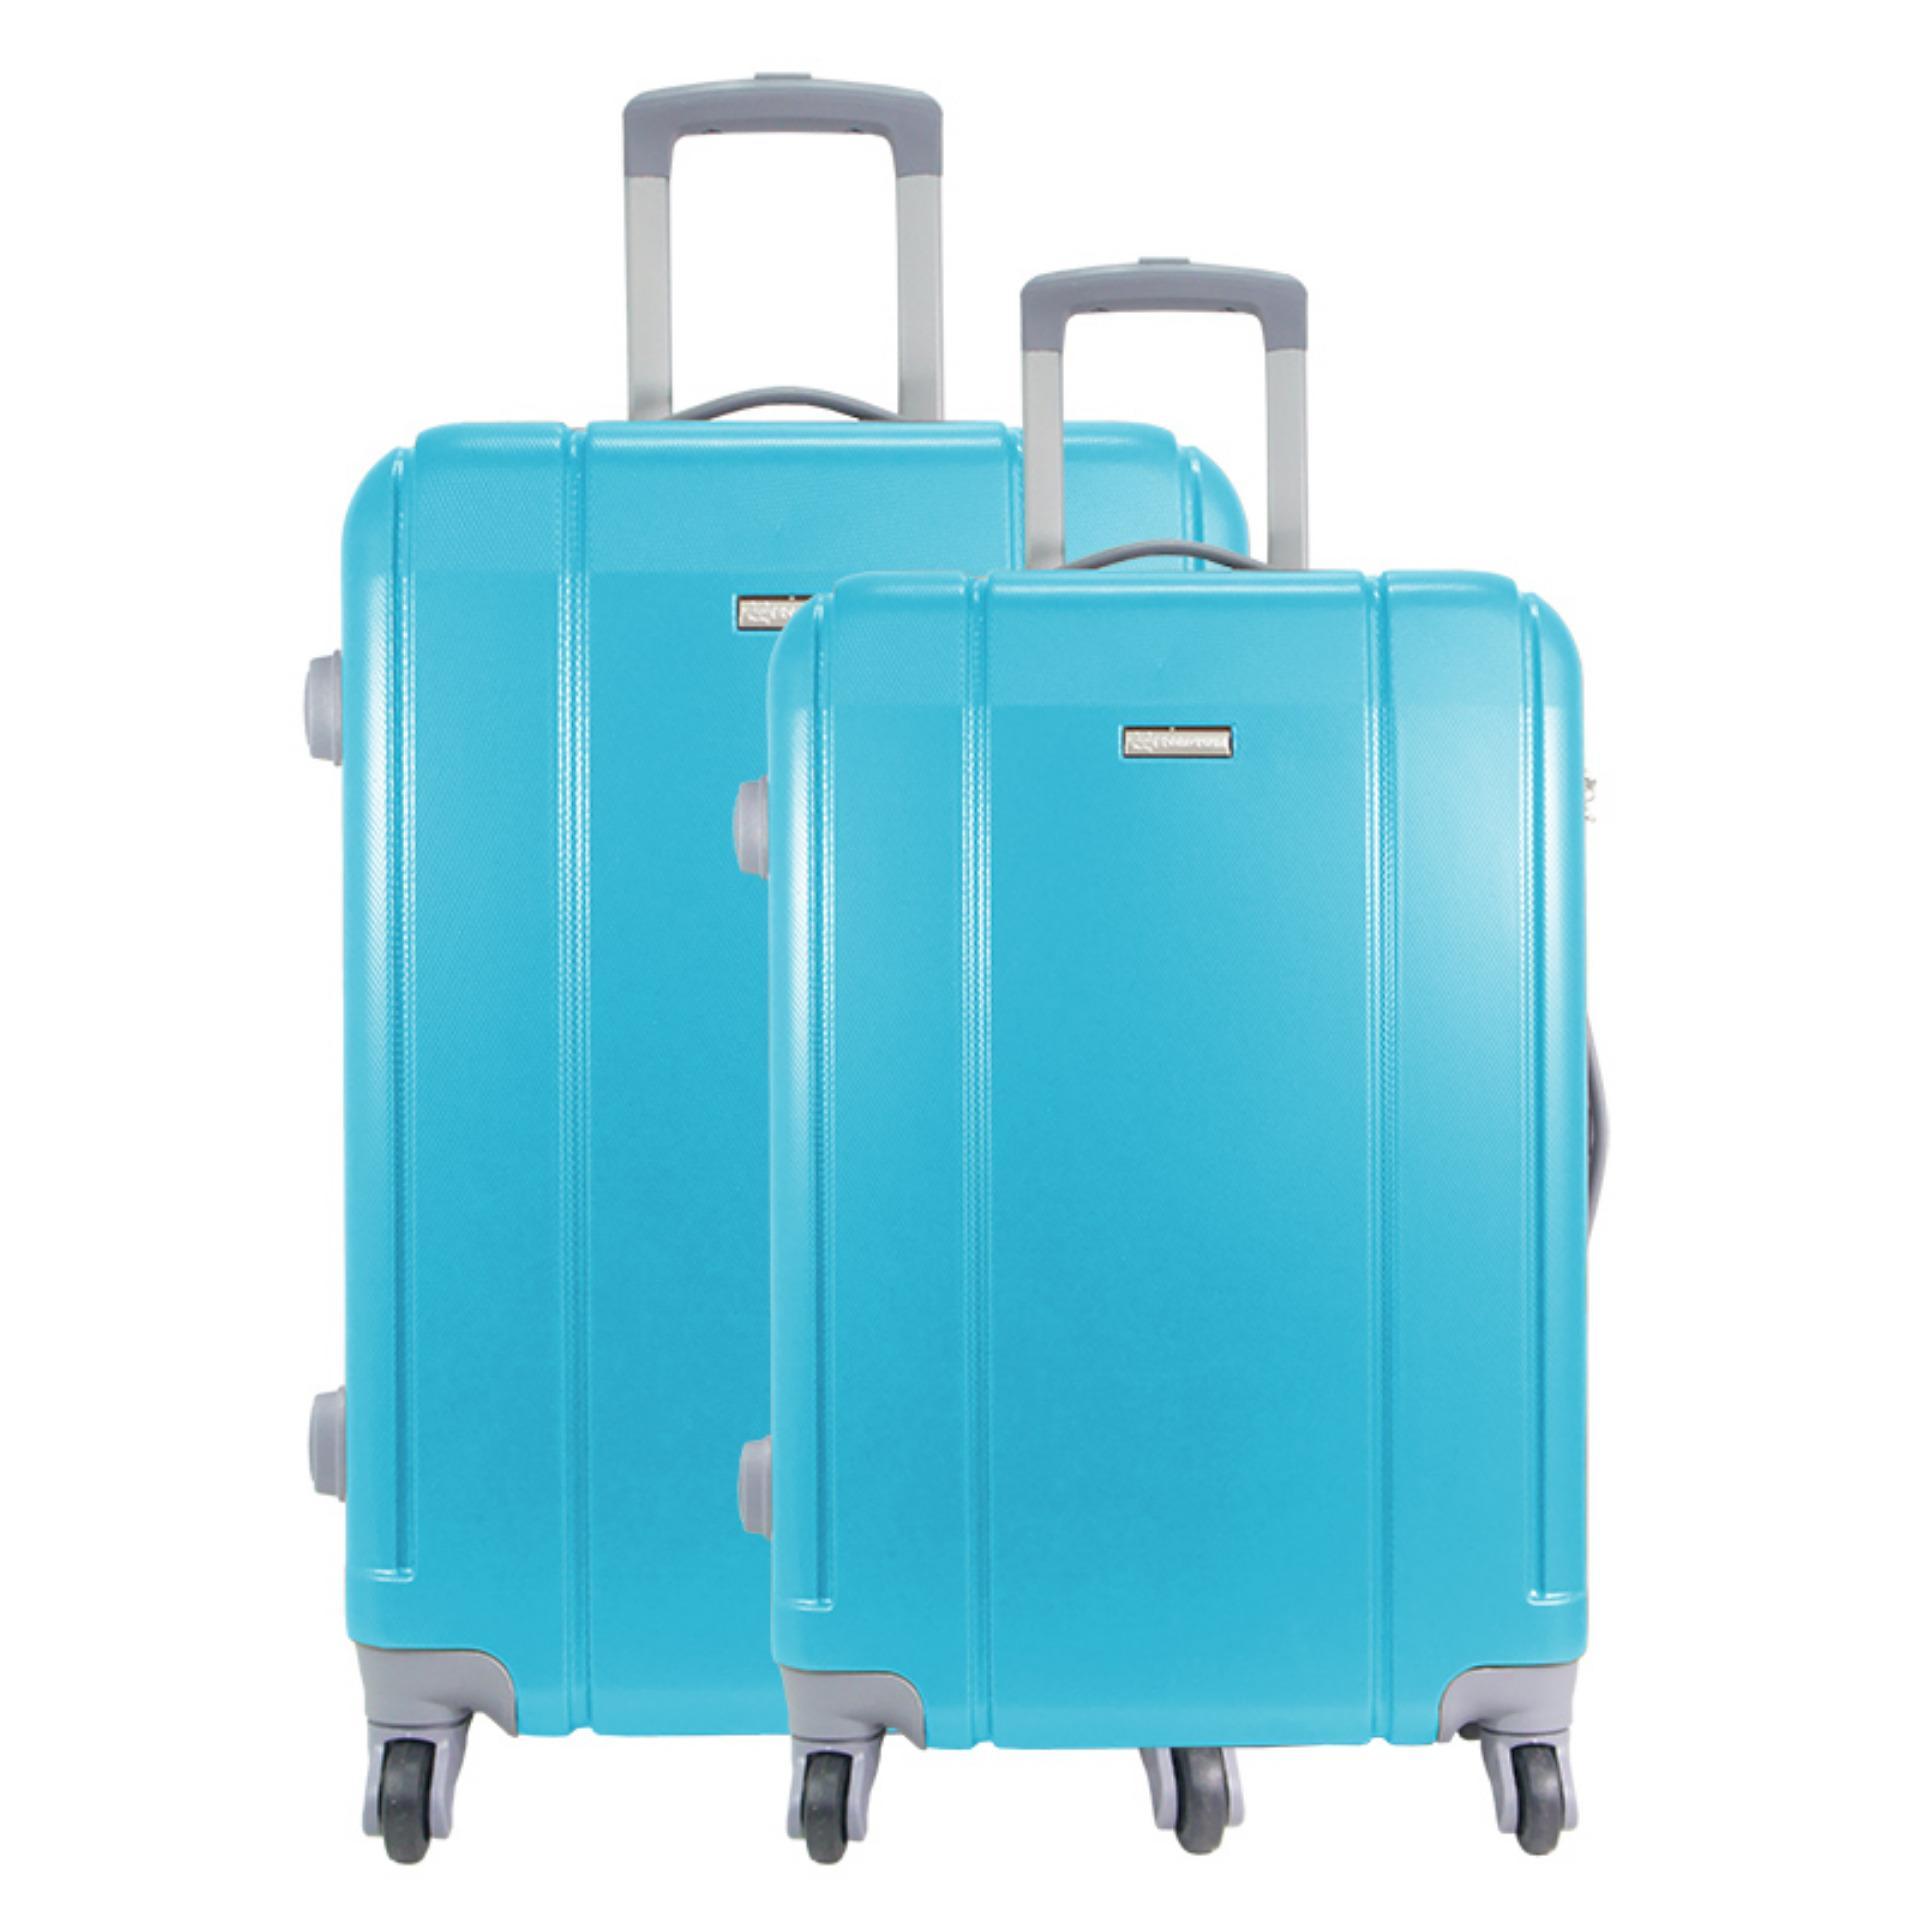 Real Polo Tas Koper Softcase Expandable 4 Roda 589 24 Inchi Coffee Passport 10121854 Twin Hd 1609 20